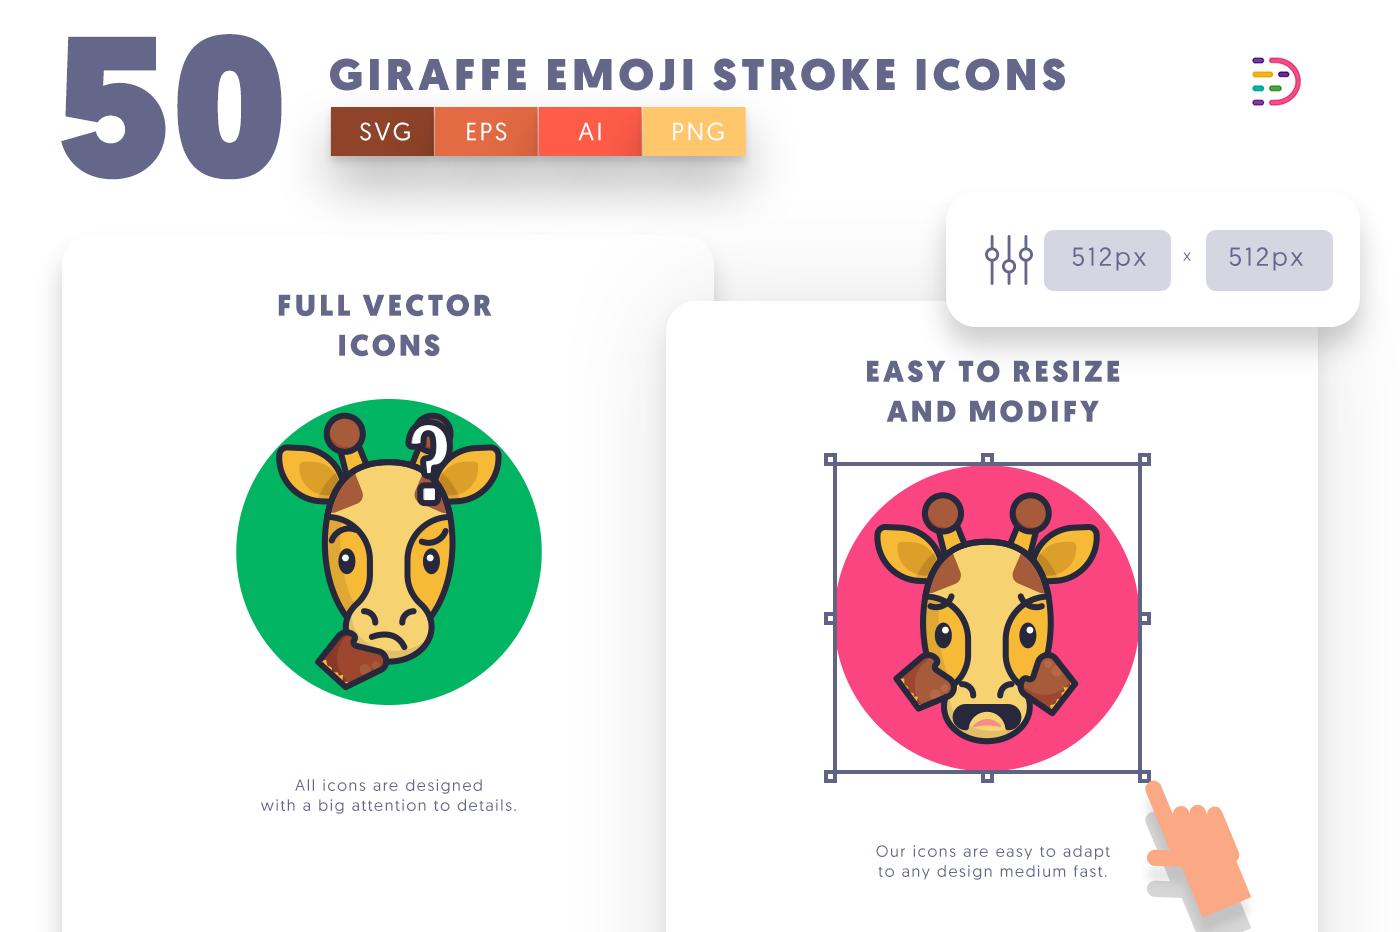 Full vector 50GiraffeEmojiStroke Icons